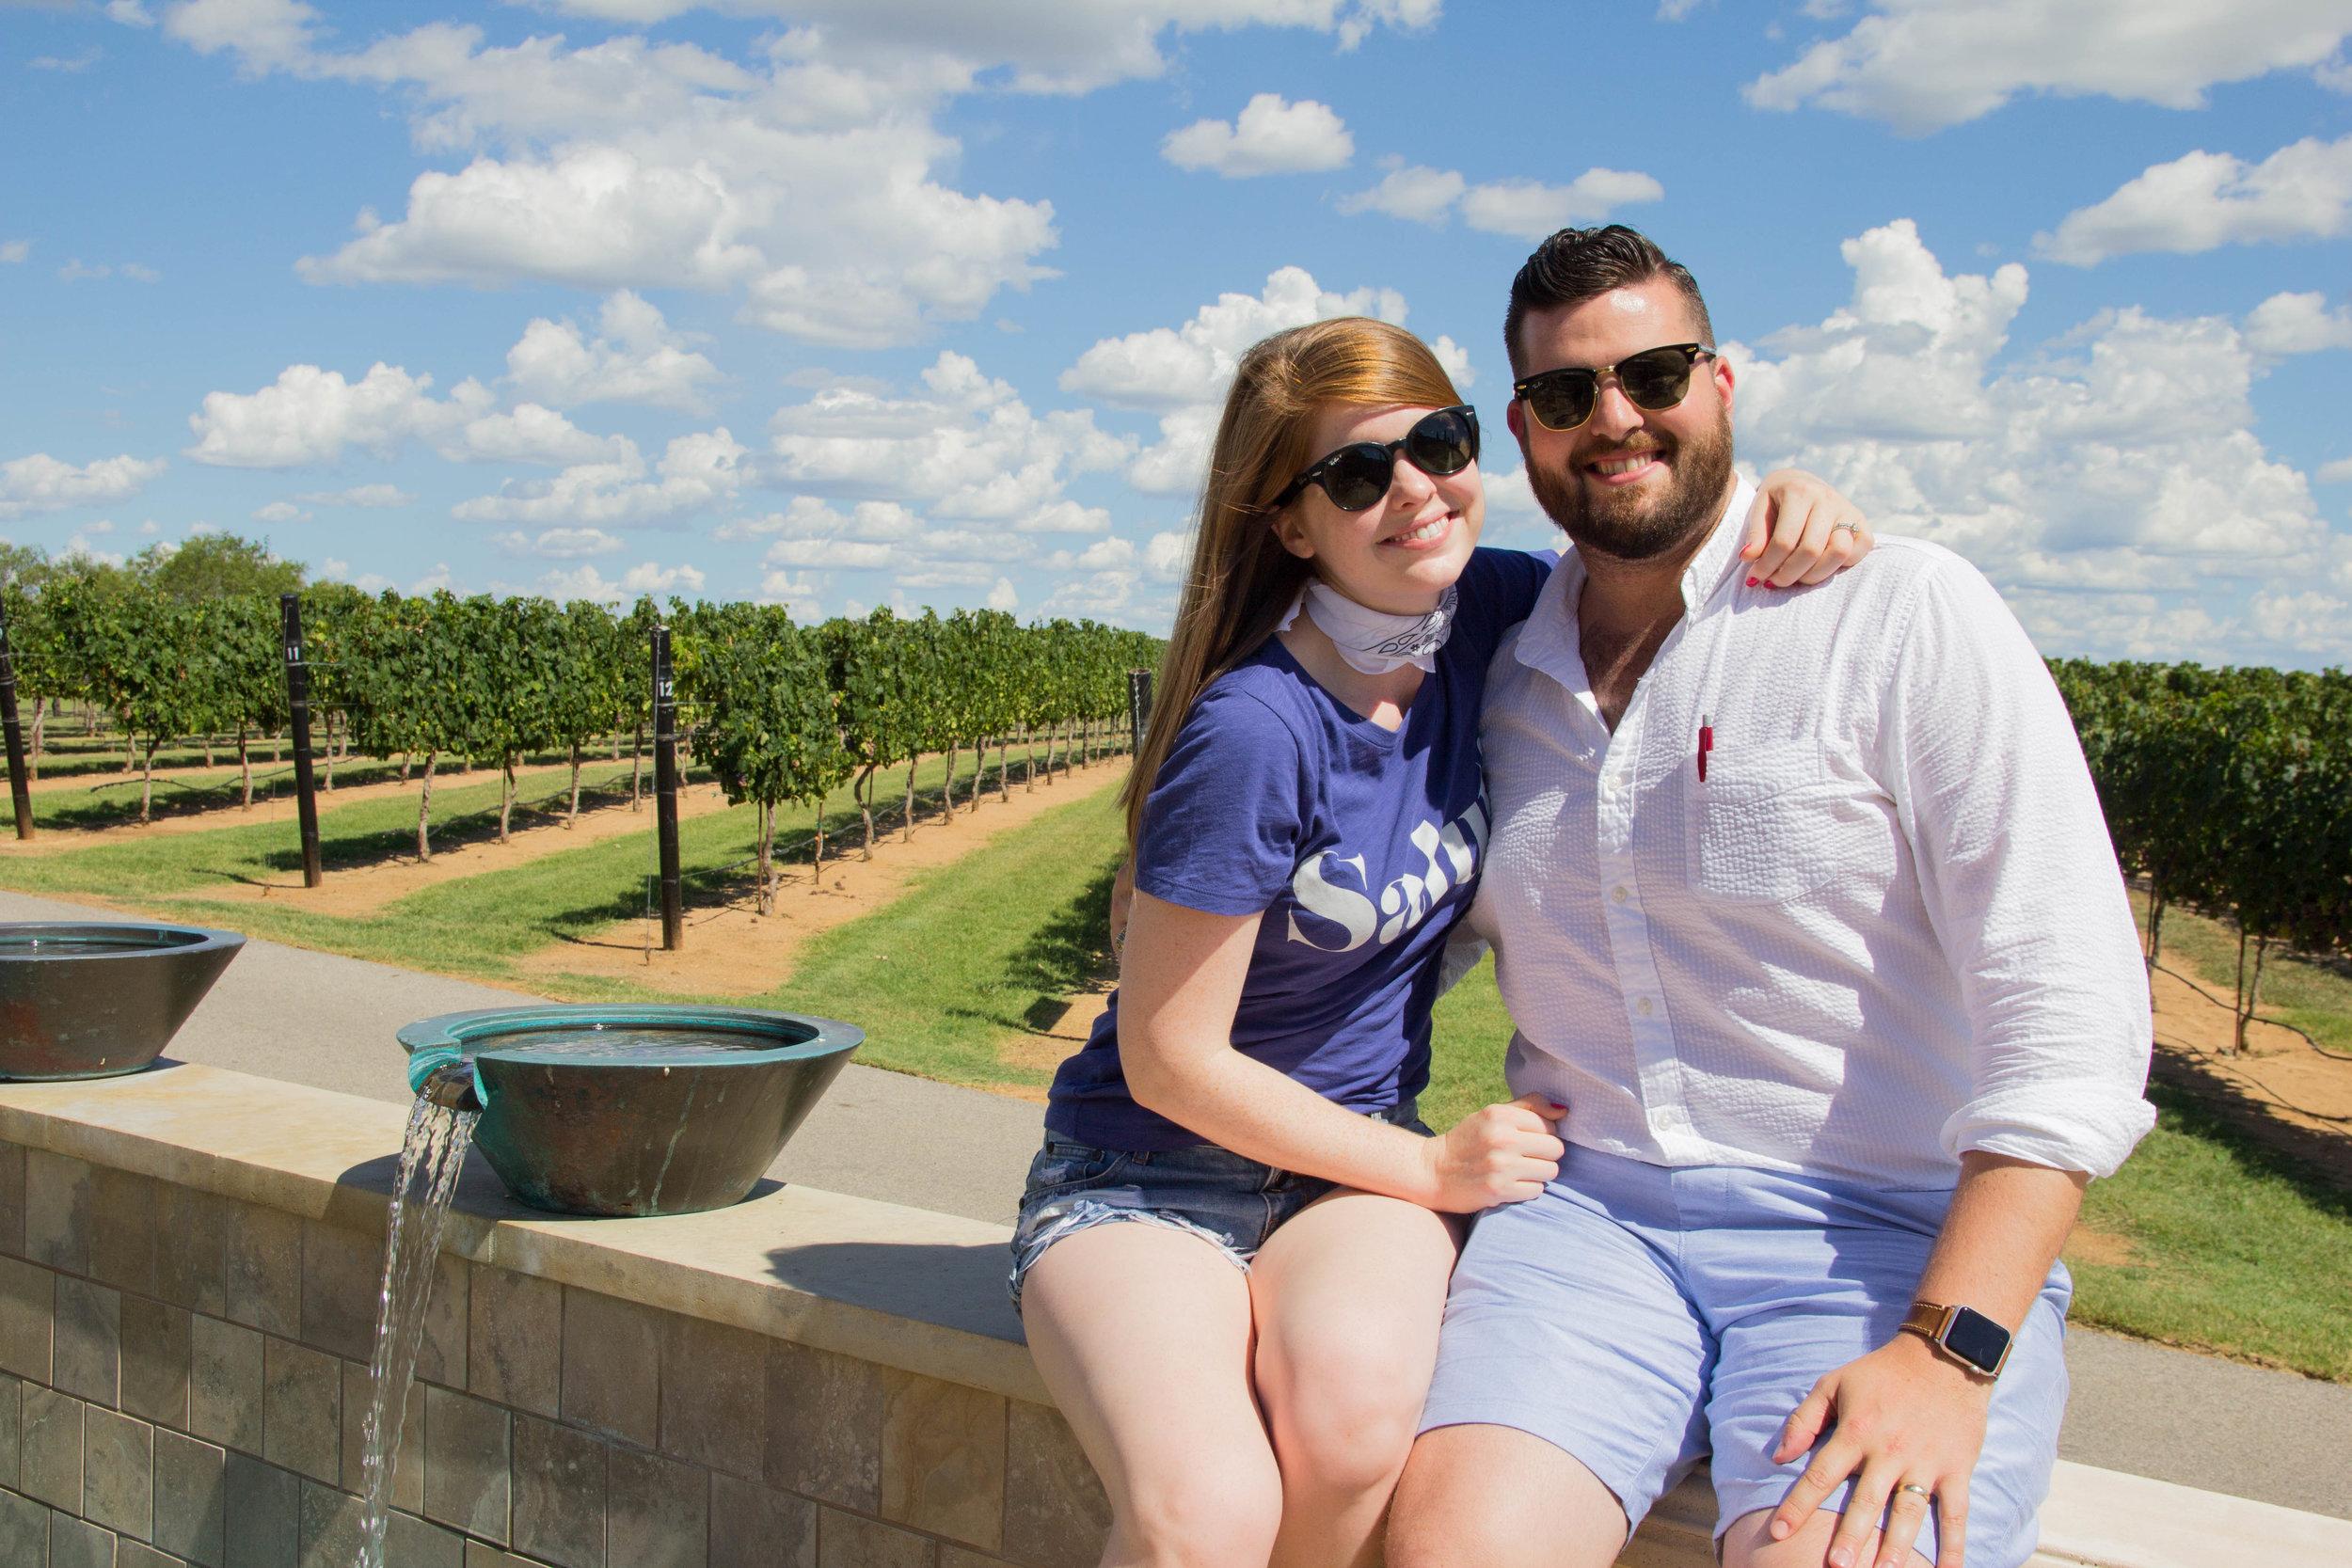 group trip to fredericksburg, texas hill country, what to do in fredericksburg, texas wineries, luckcenbach texas, texas road trips, grapecreek